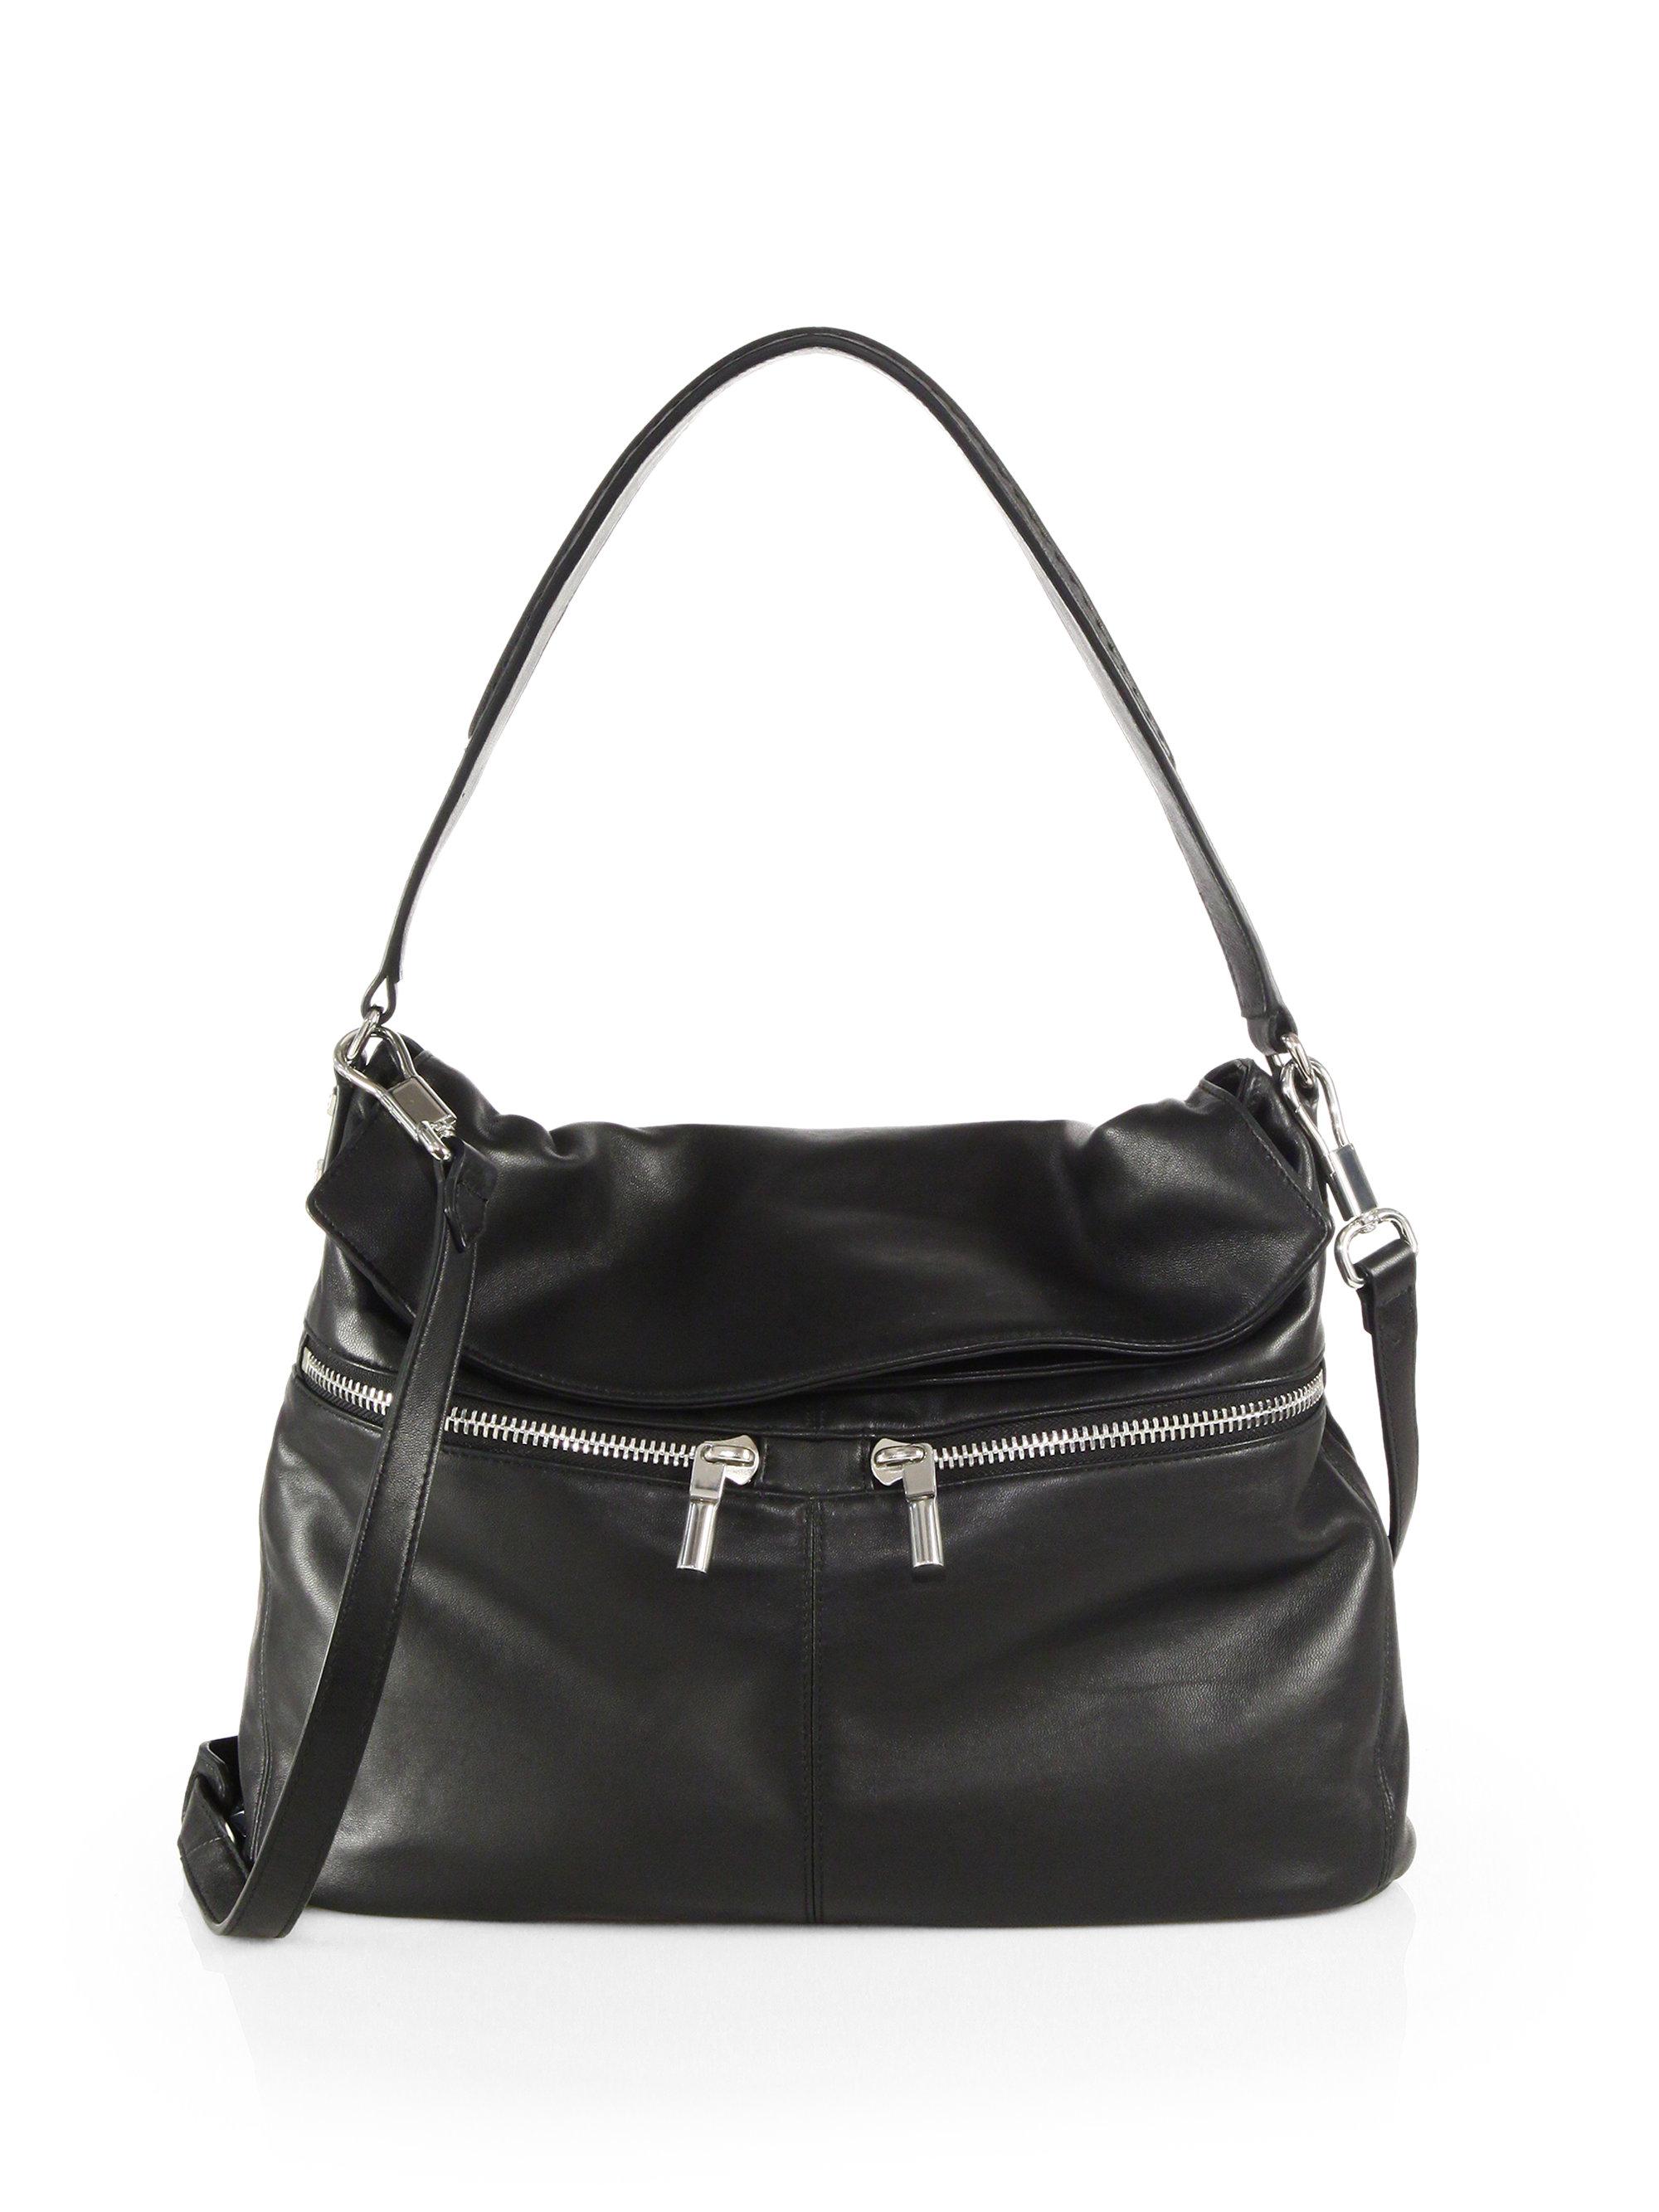 Elizabeth and james James Convertible Hobo Bag in Black | Lyst